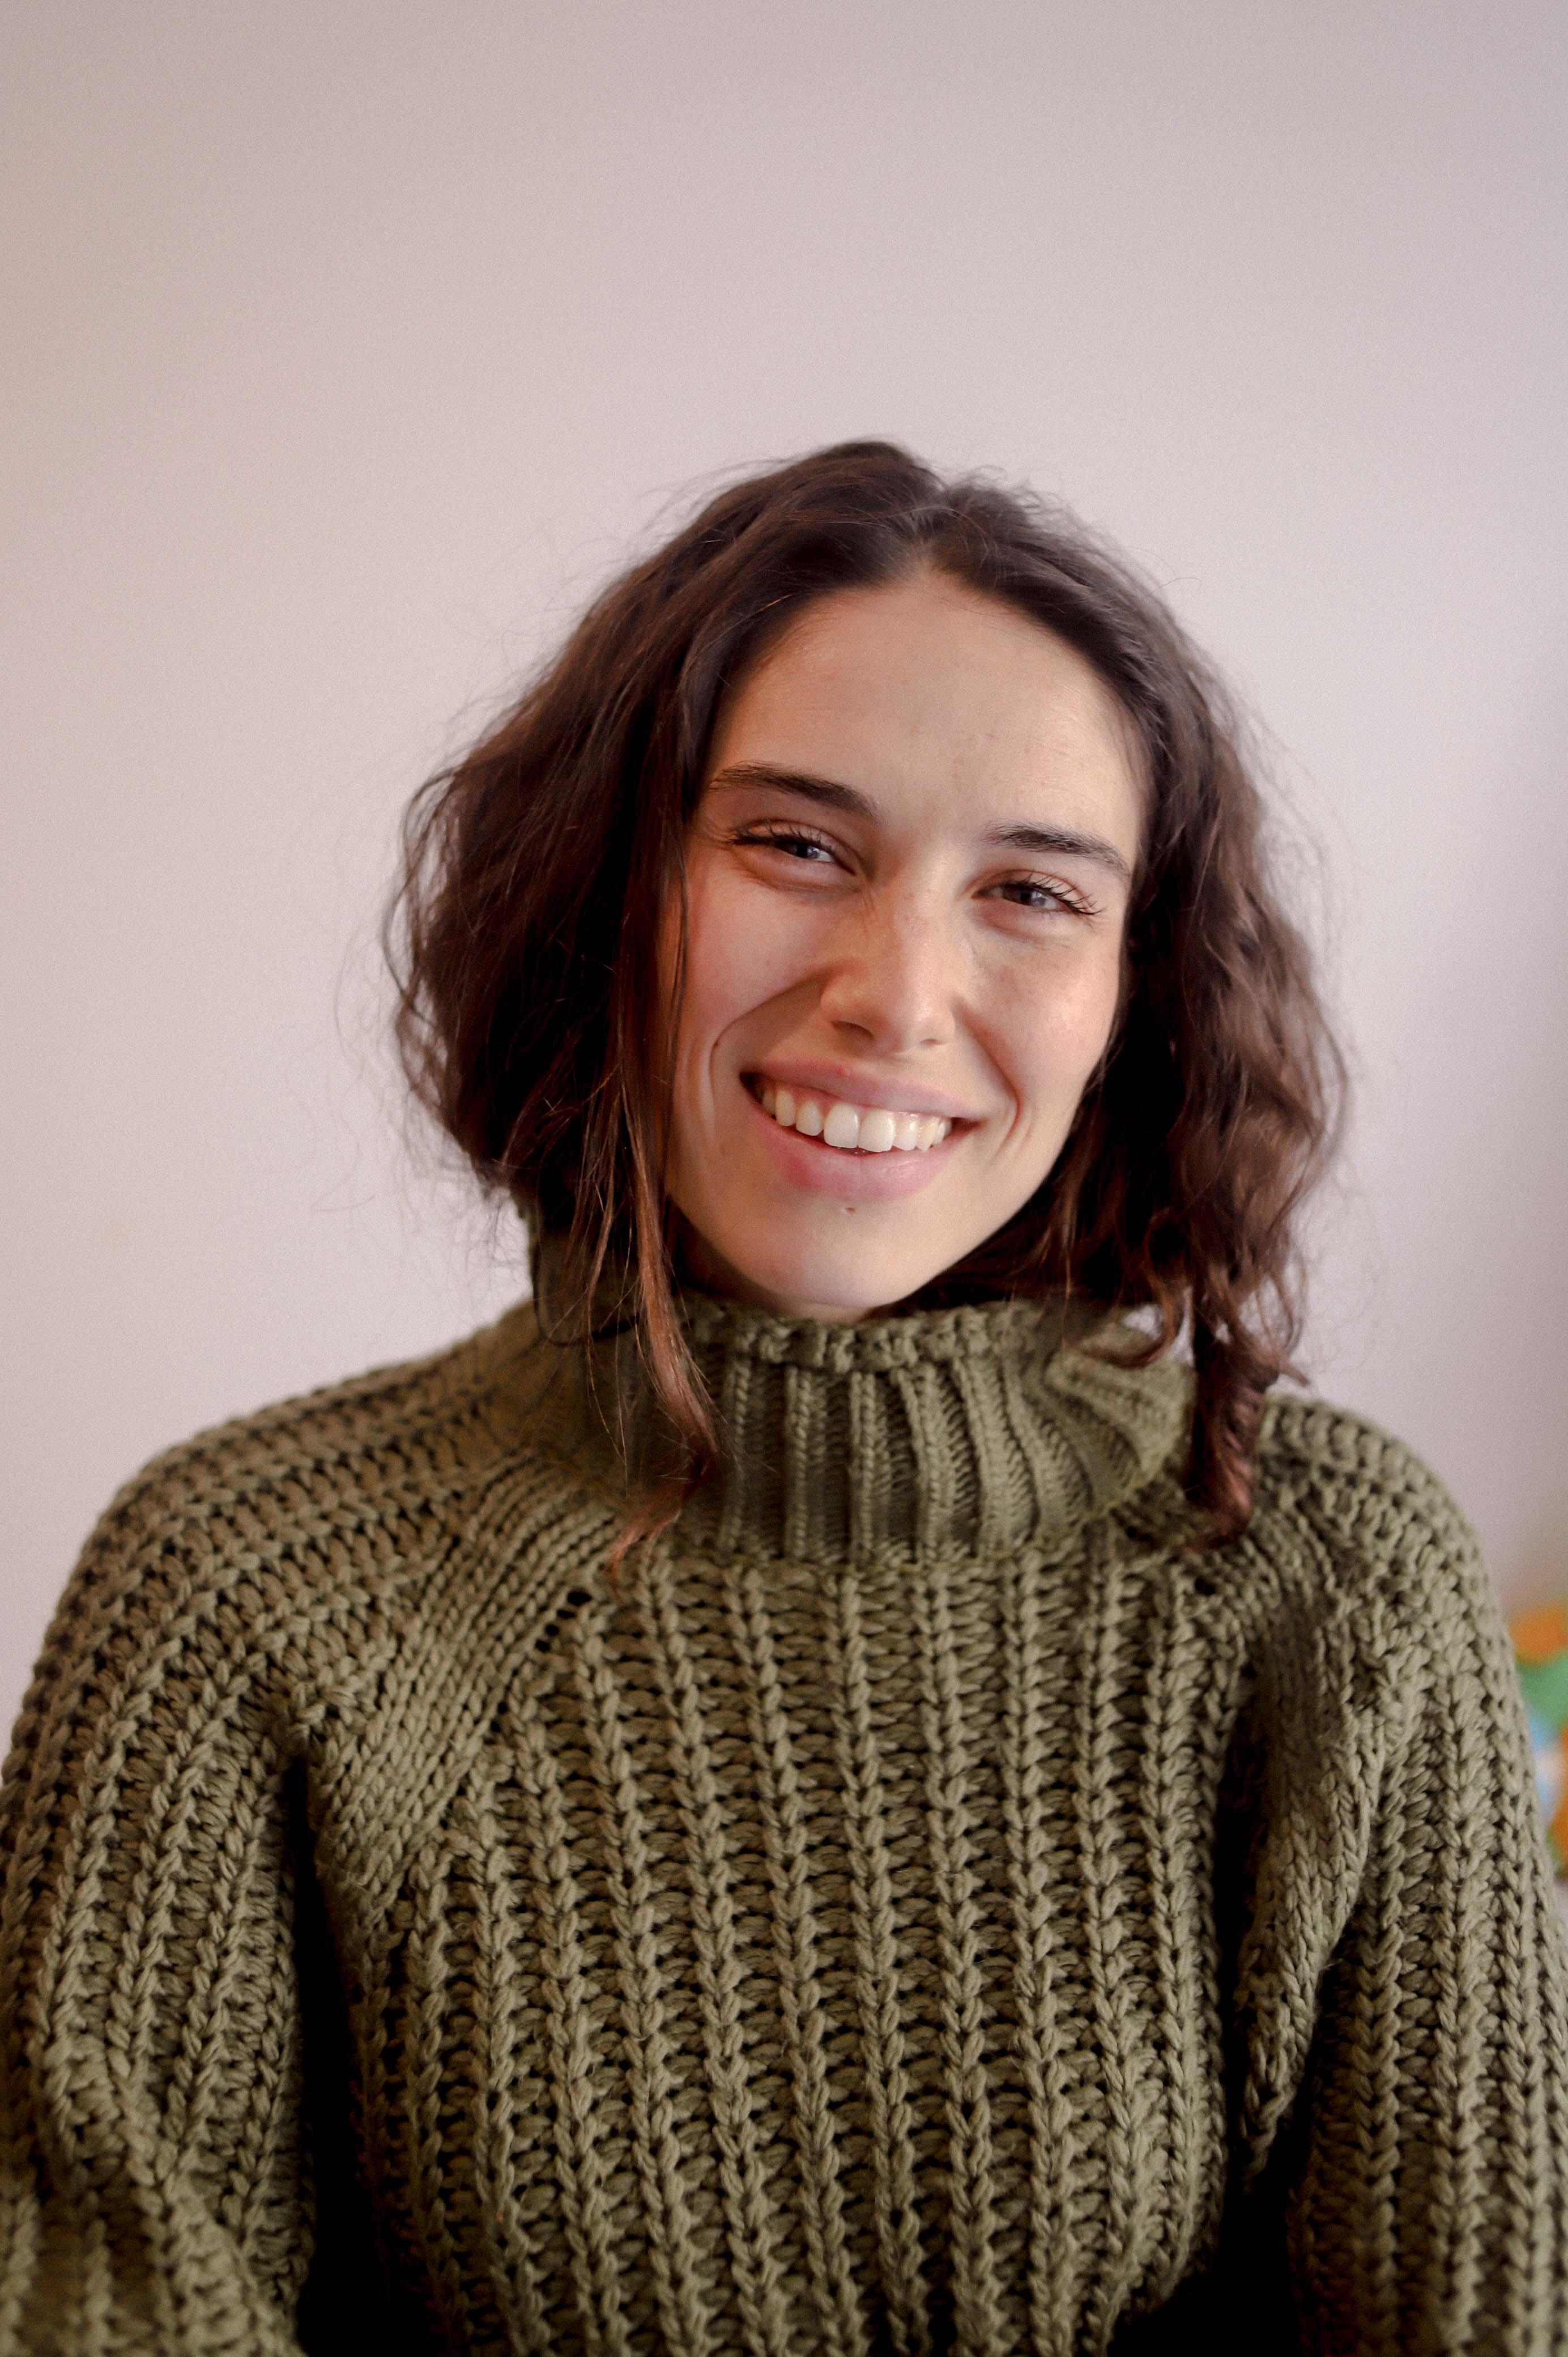 Dora Moutot